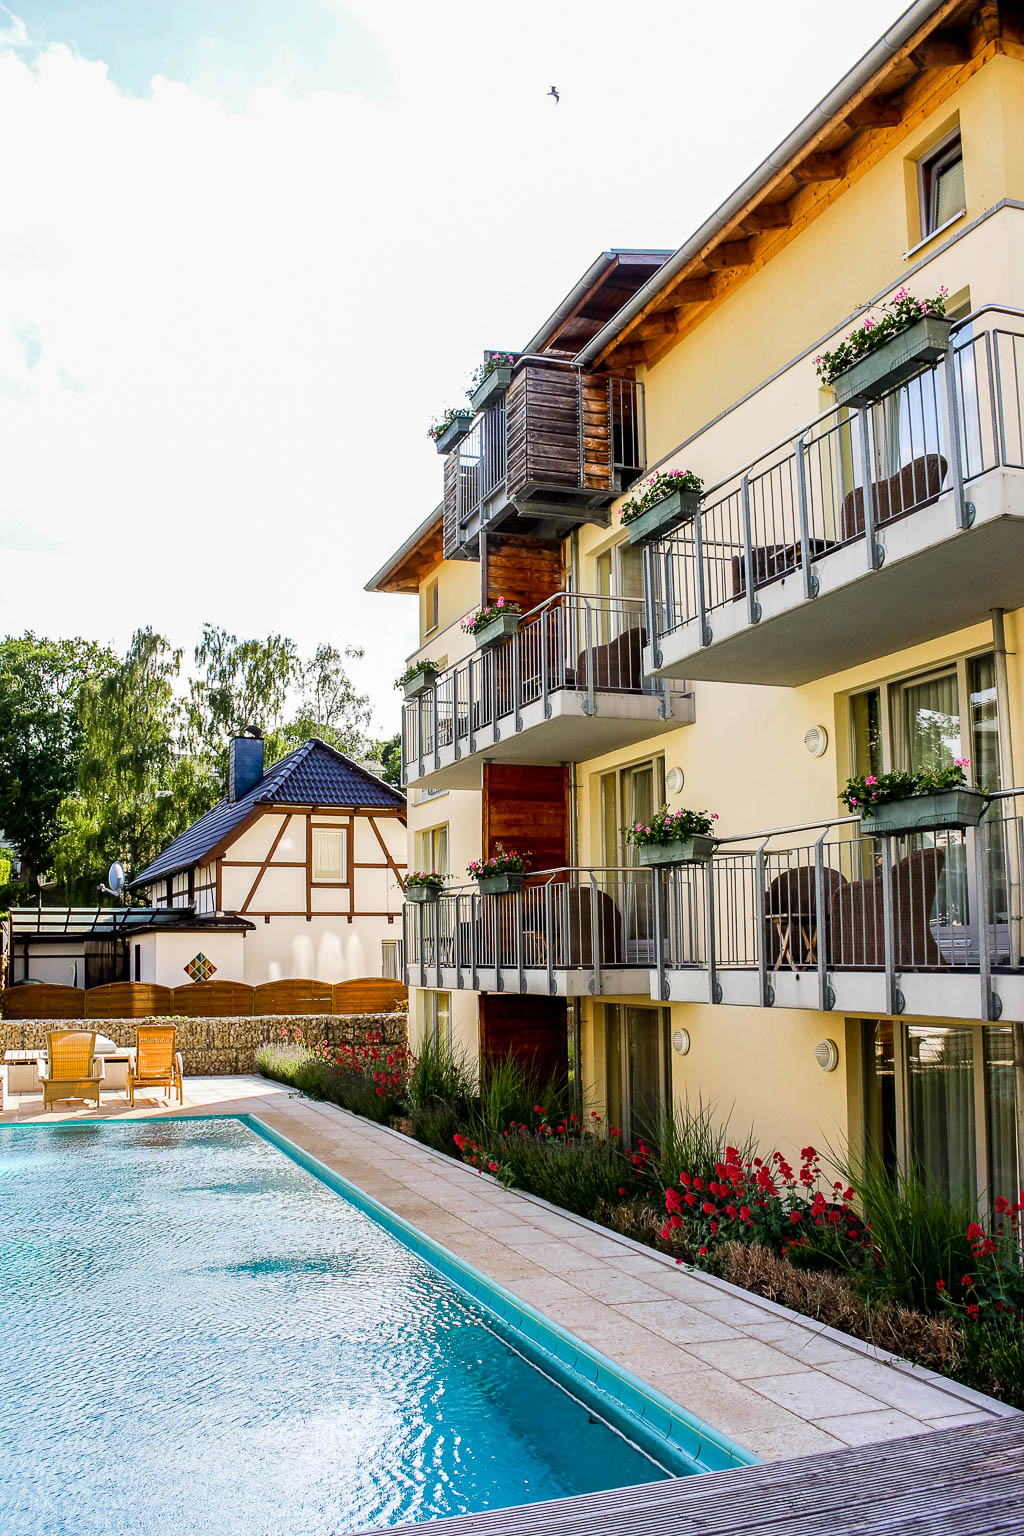 Urlaub im Strand-Hotel Heringsdorf auf Usedom